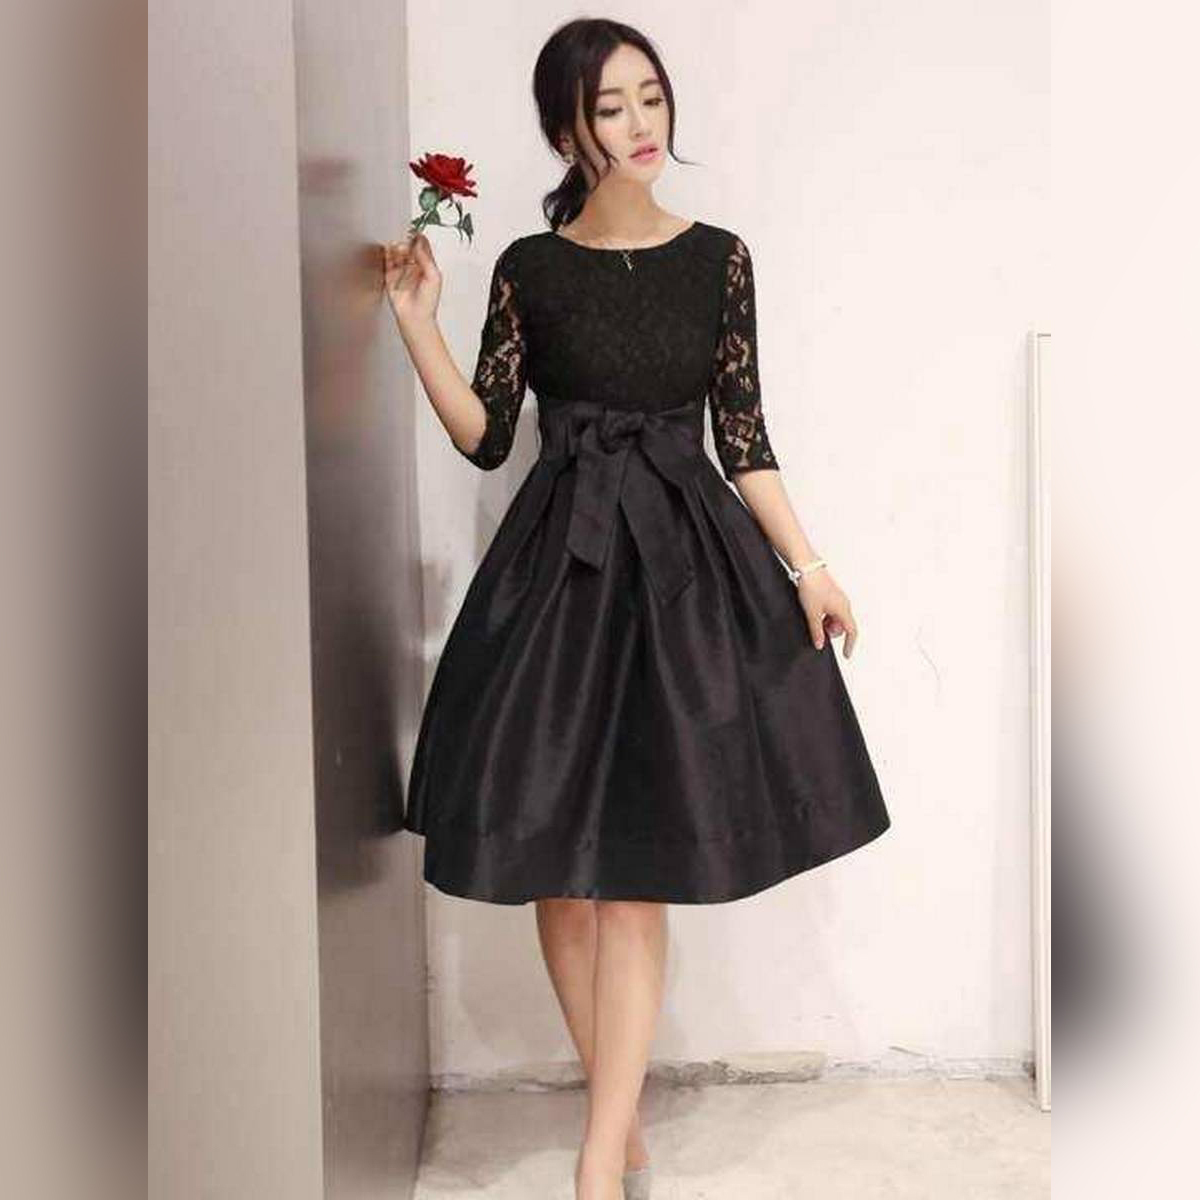 Meeza Fashionstore Black Stylish Net with Bow Belt Frock for Women